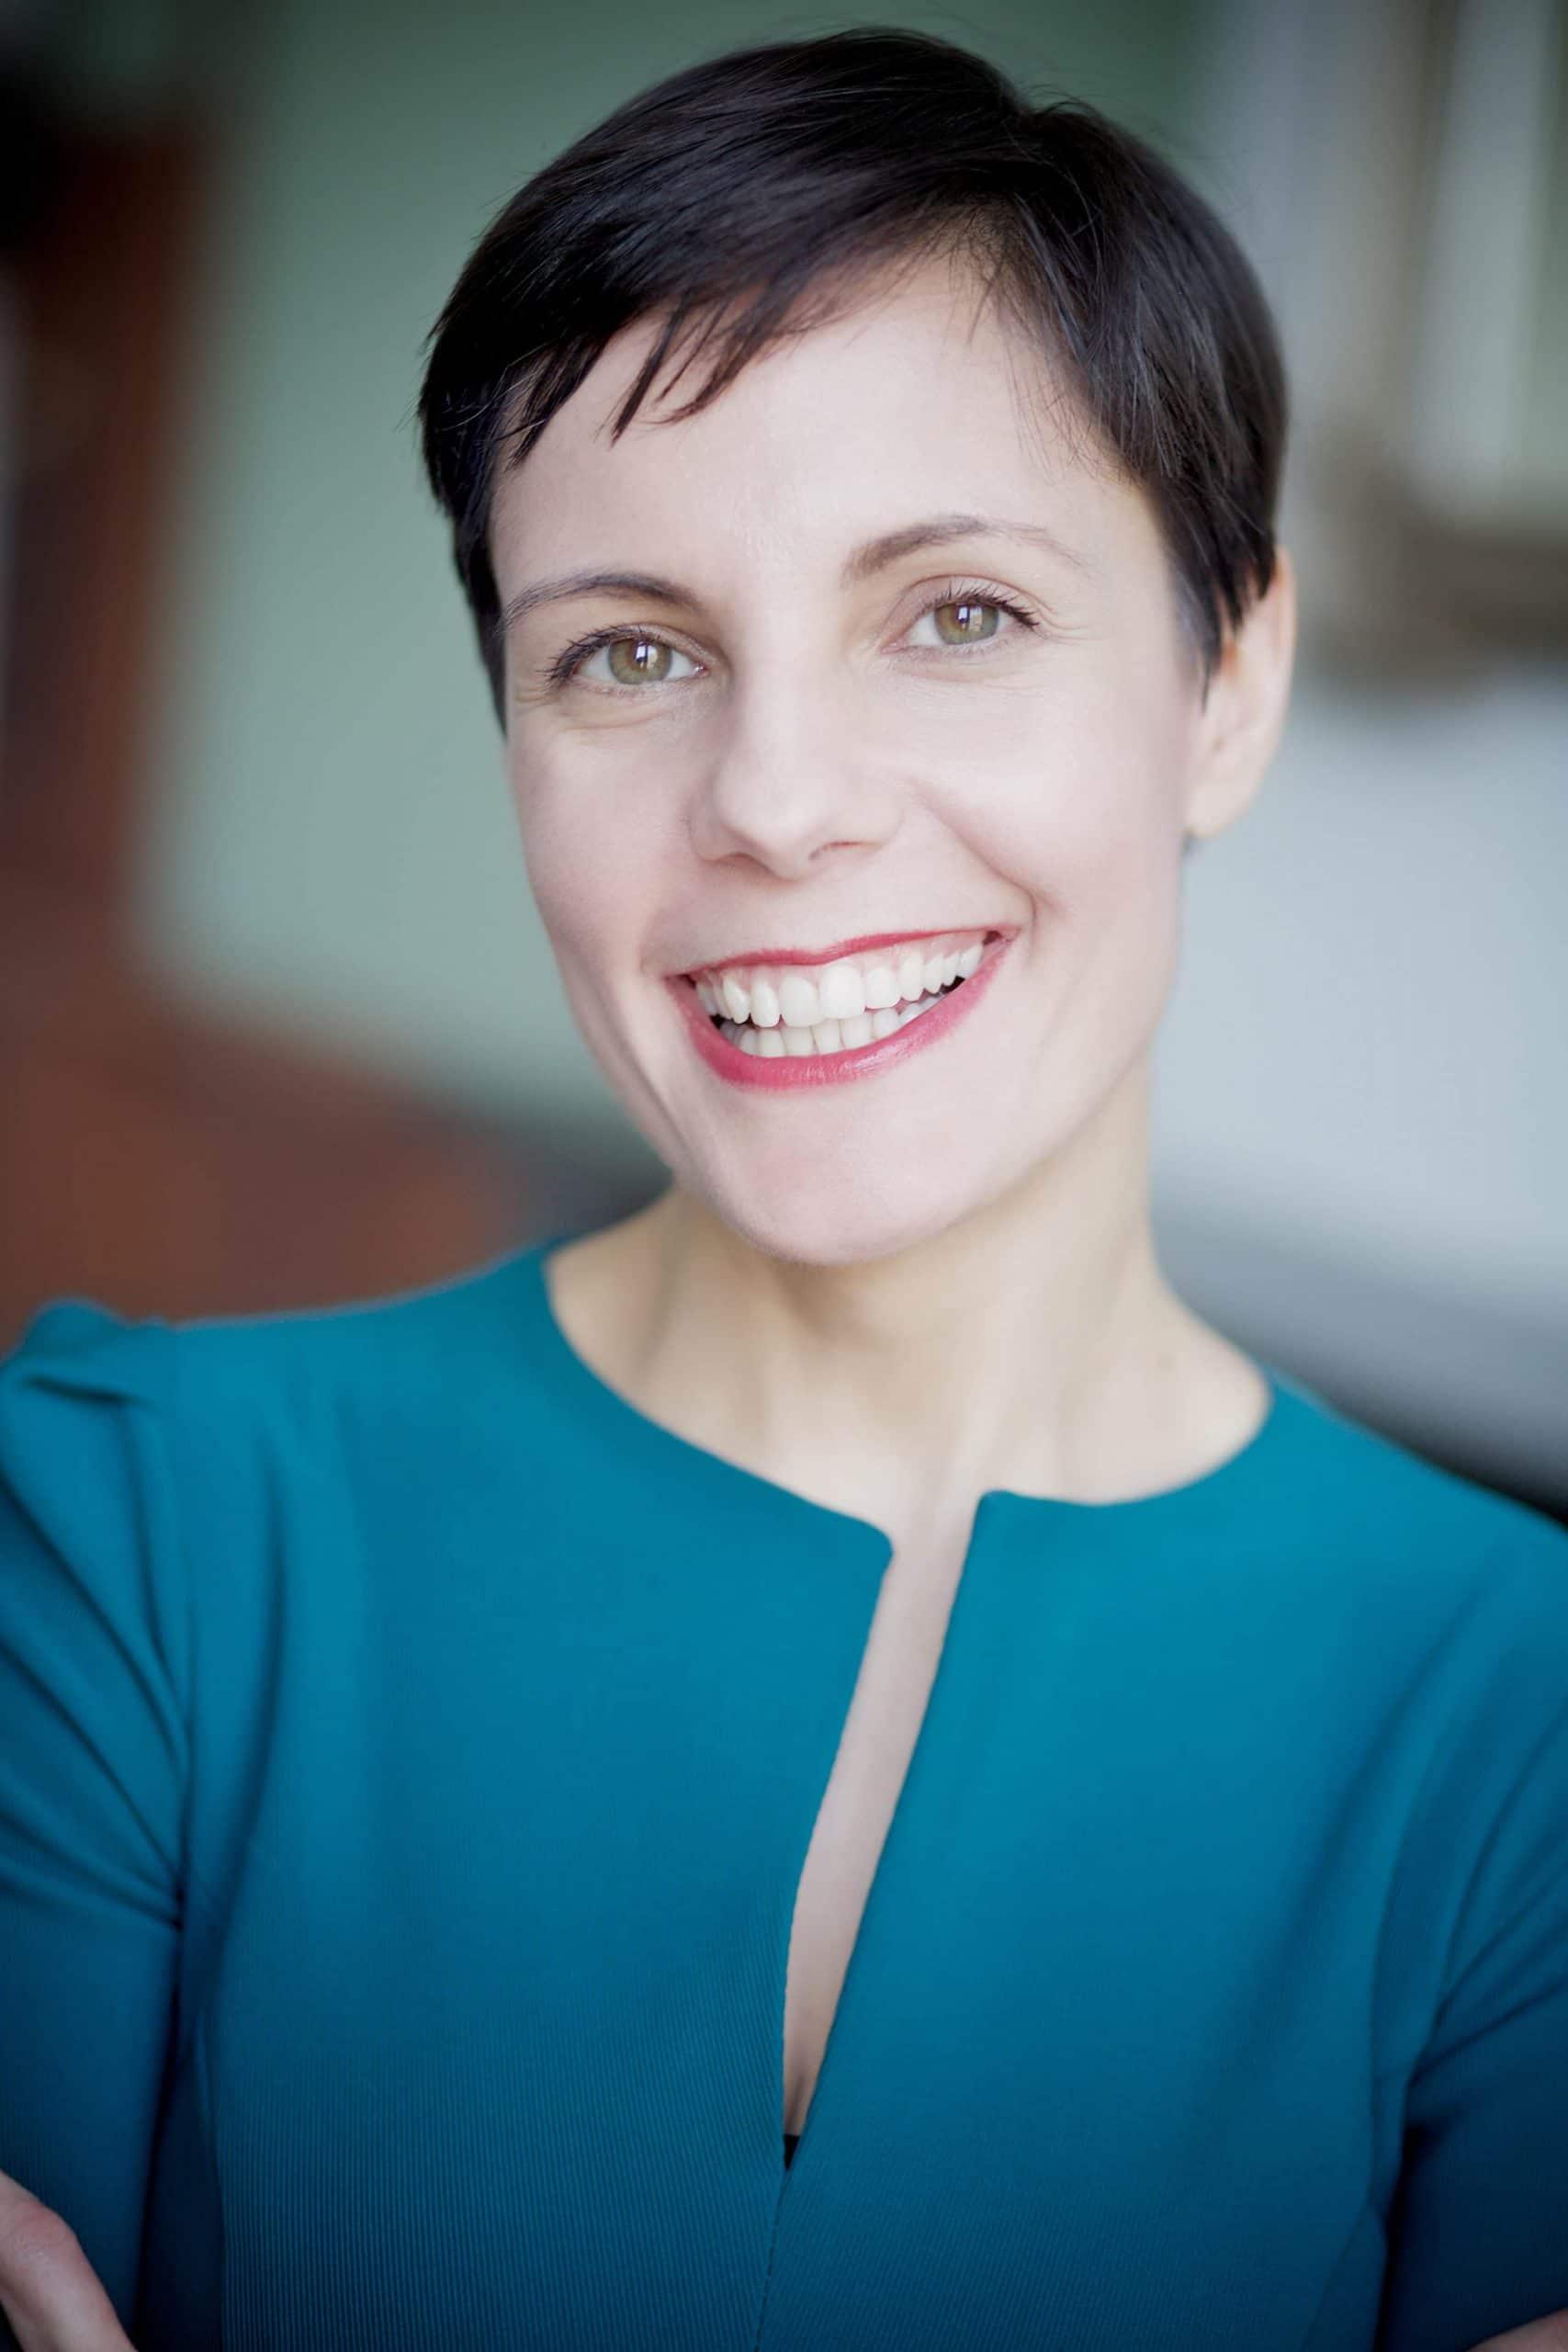 Bojana on motherhood, career change and her new cookbook